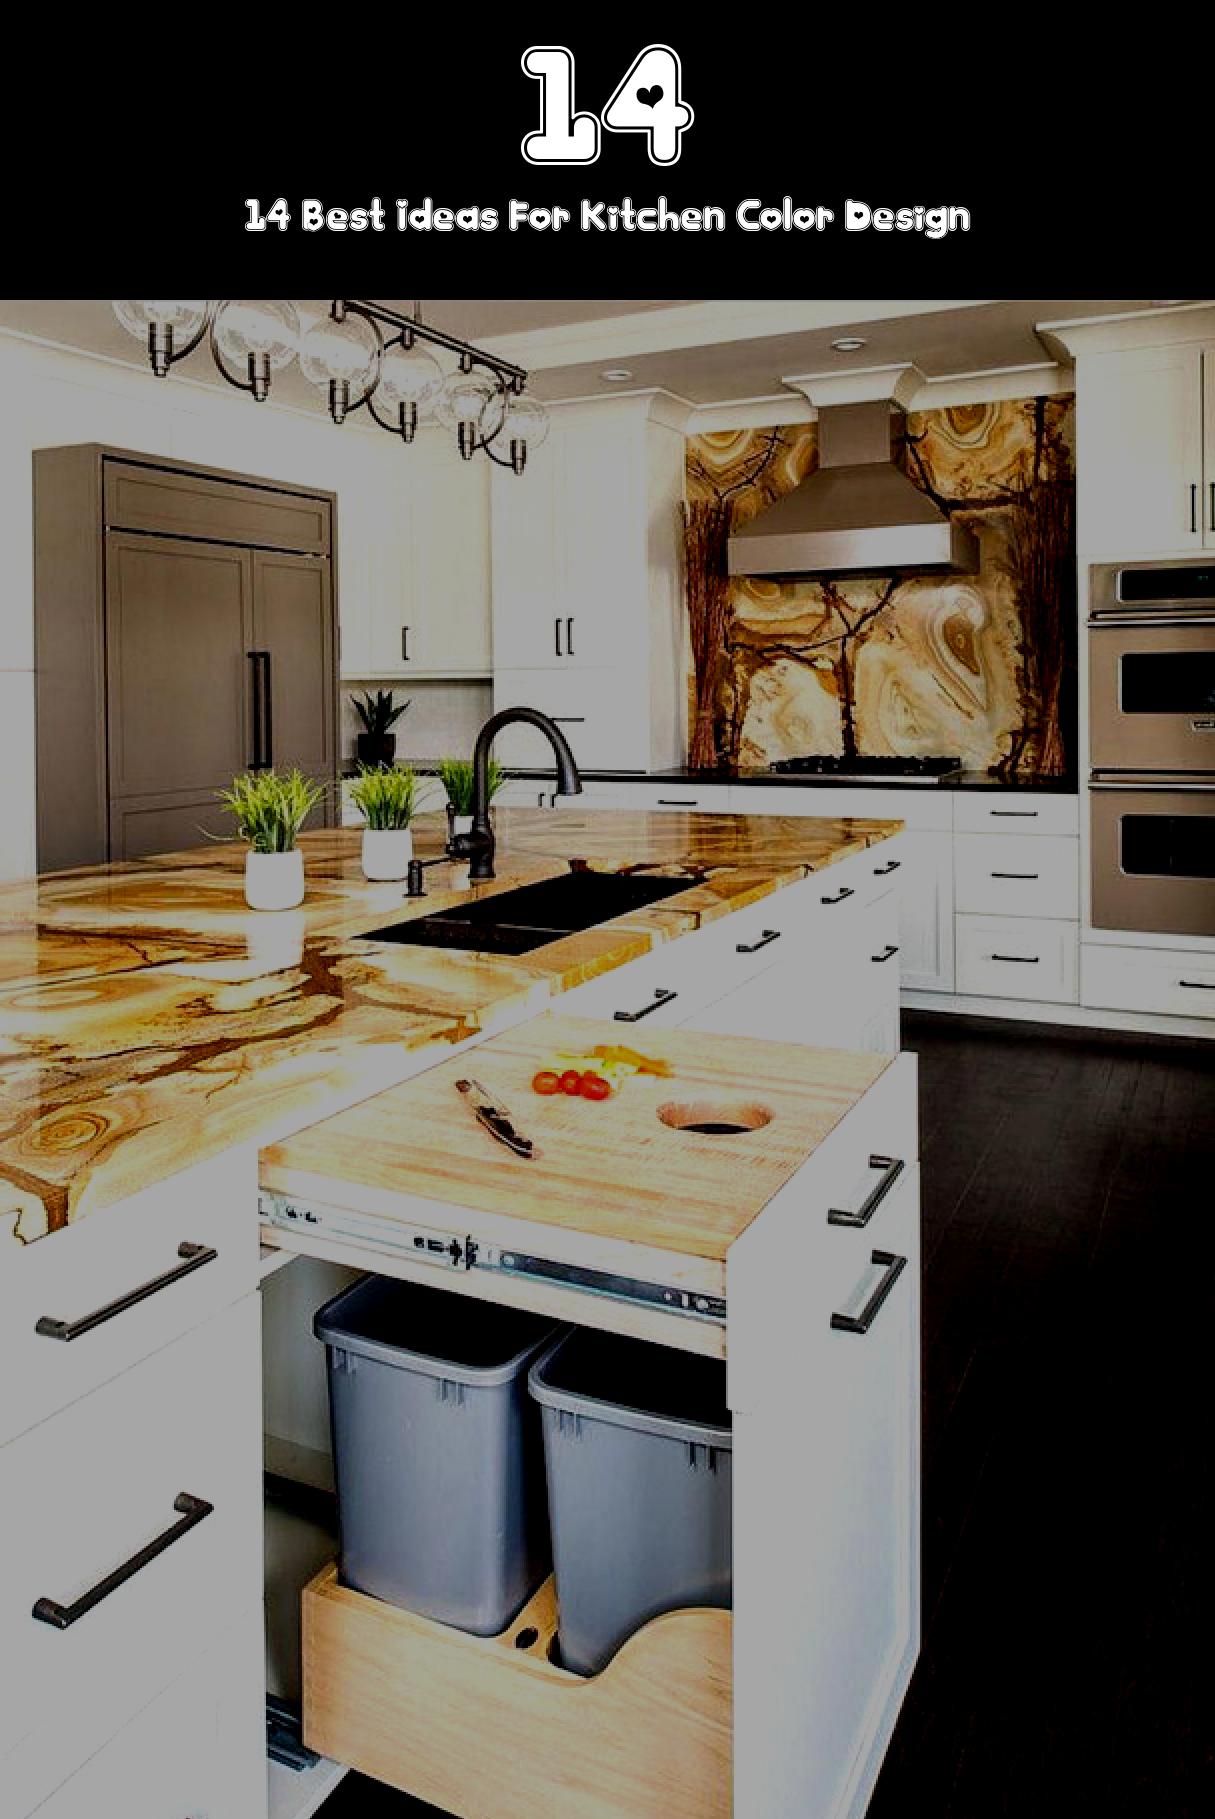 Tumblr In 2020 Small Cottage Kitchen Kitchen Cabinet Design Cottage Kitchen Cabinets